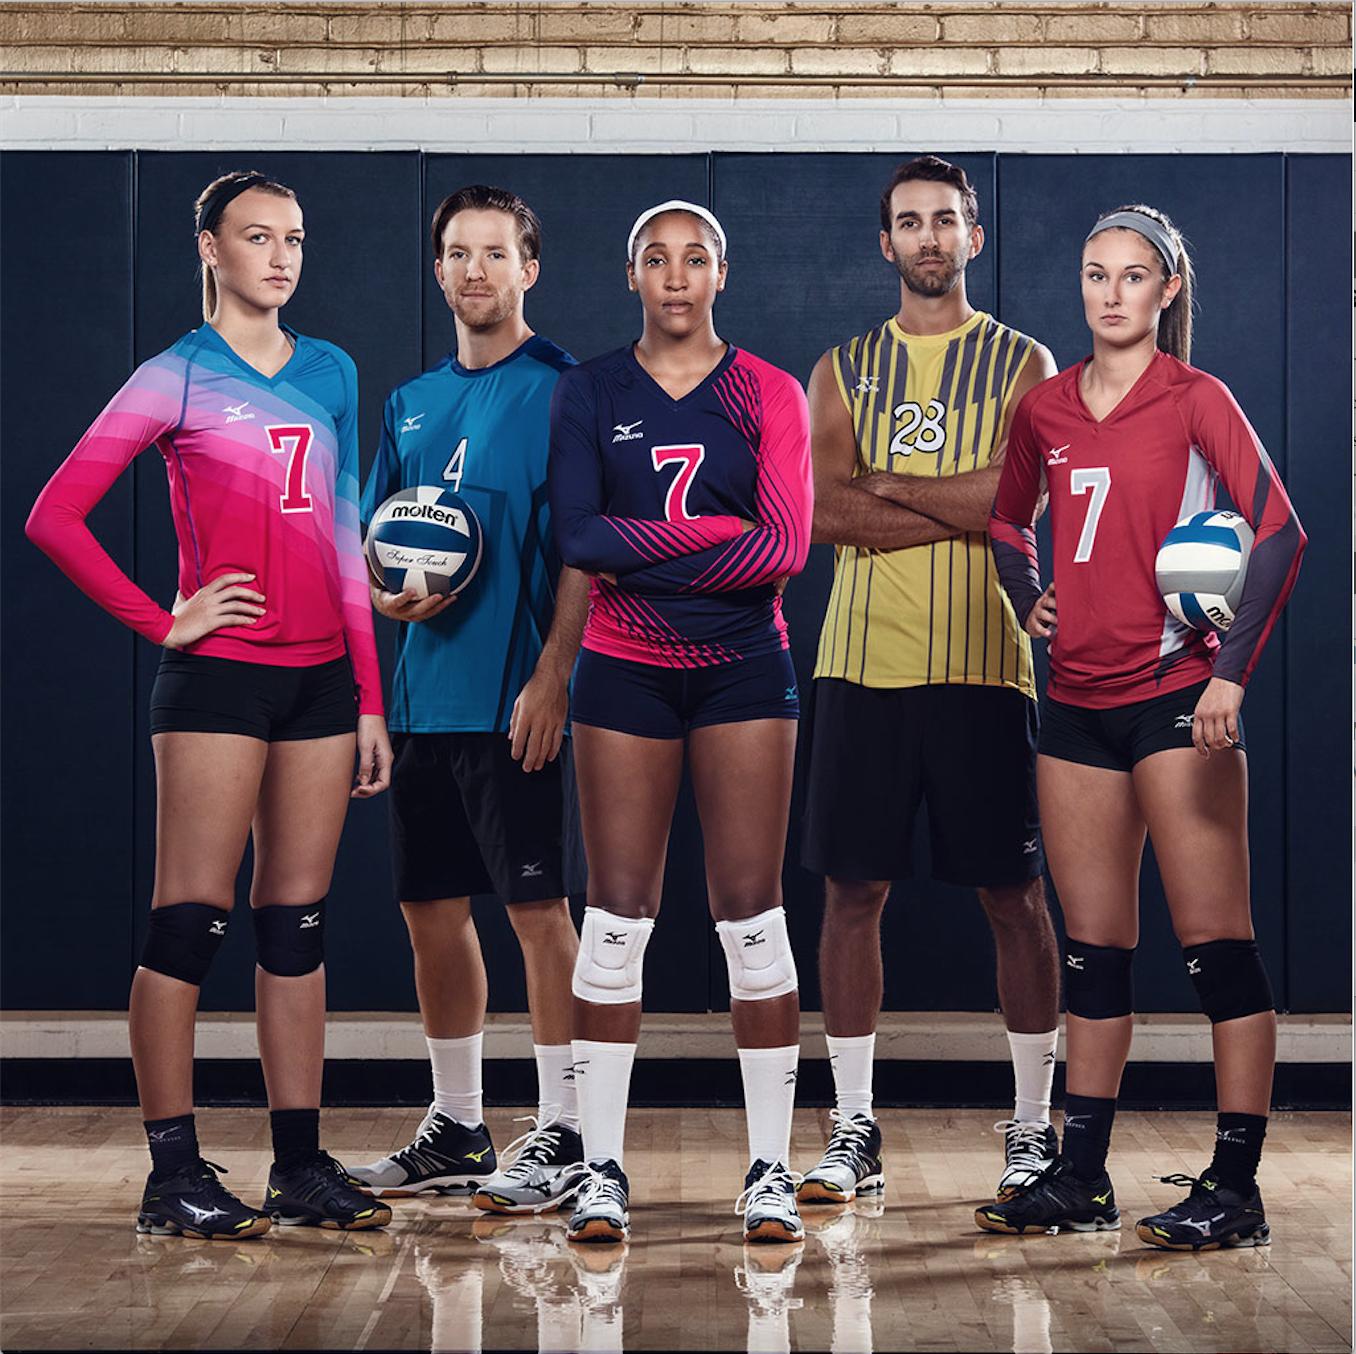 mizuno volleyball jerseys canada store